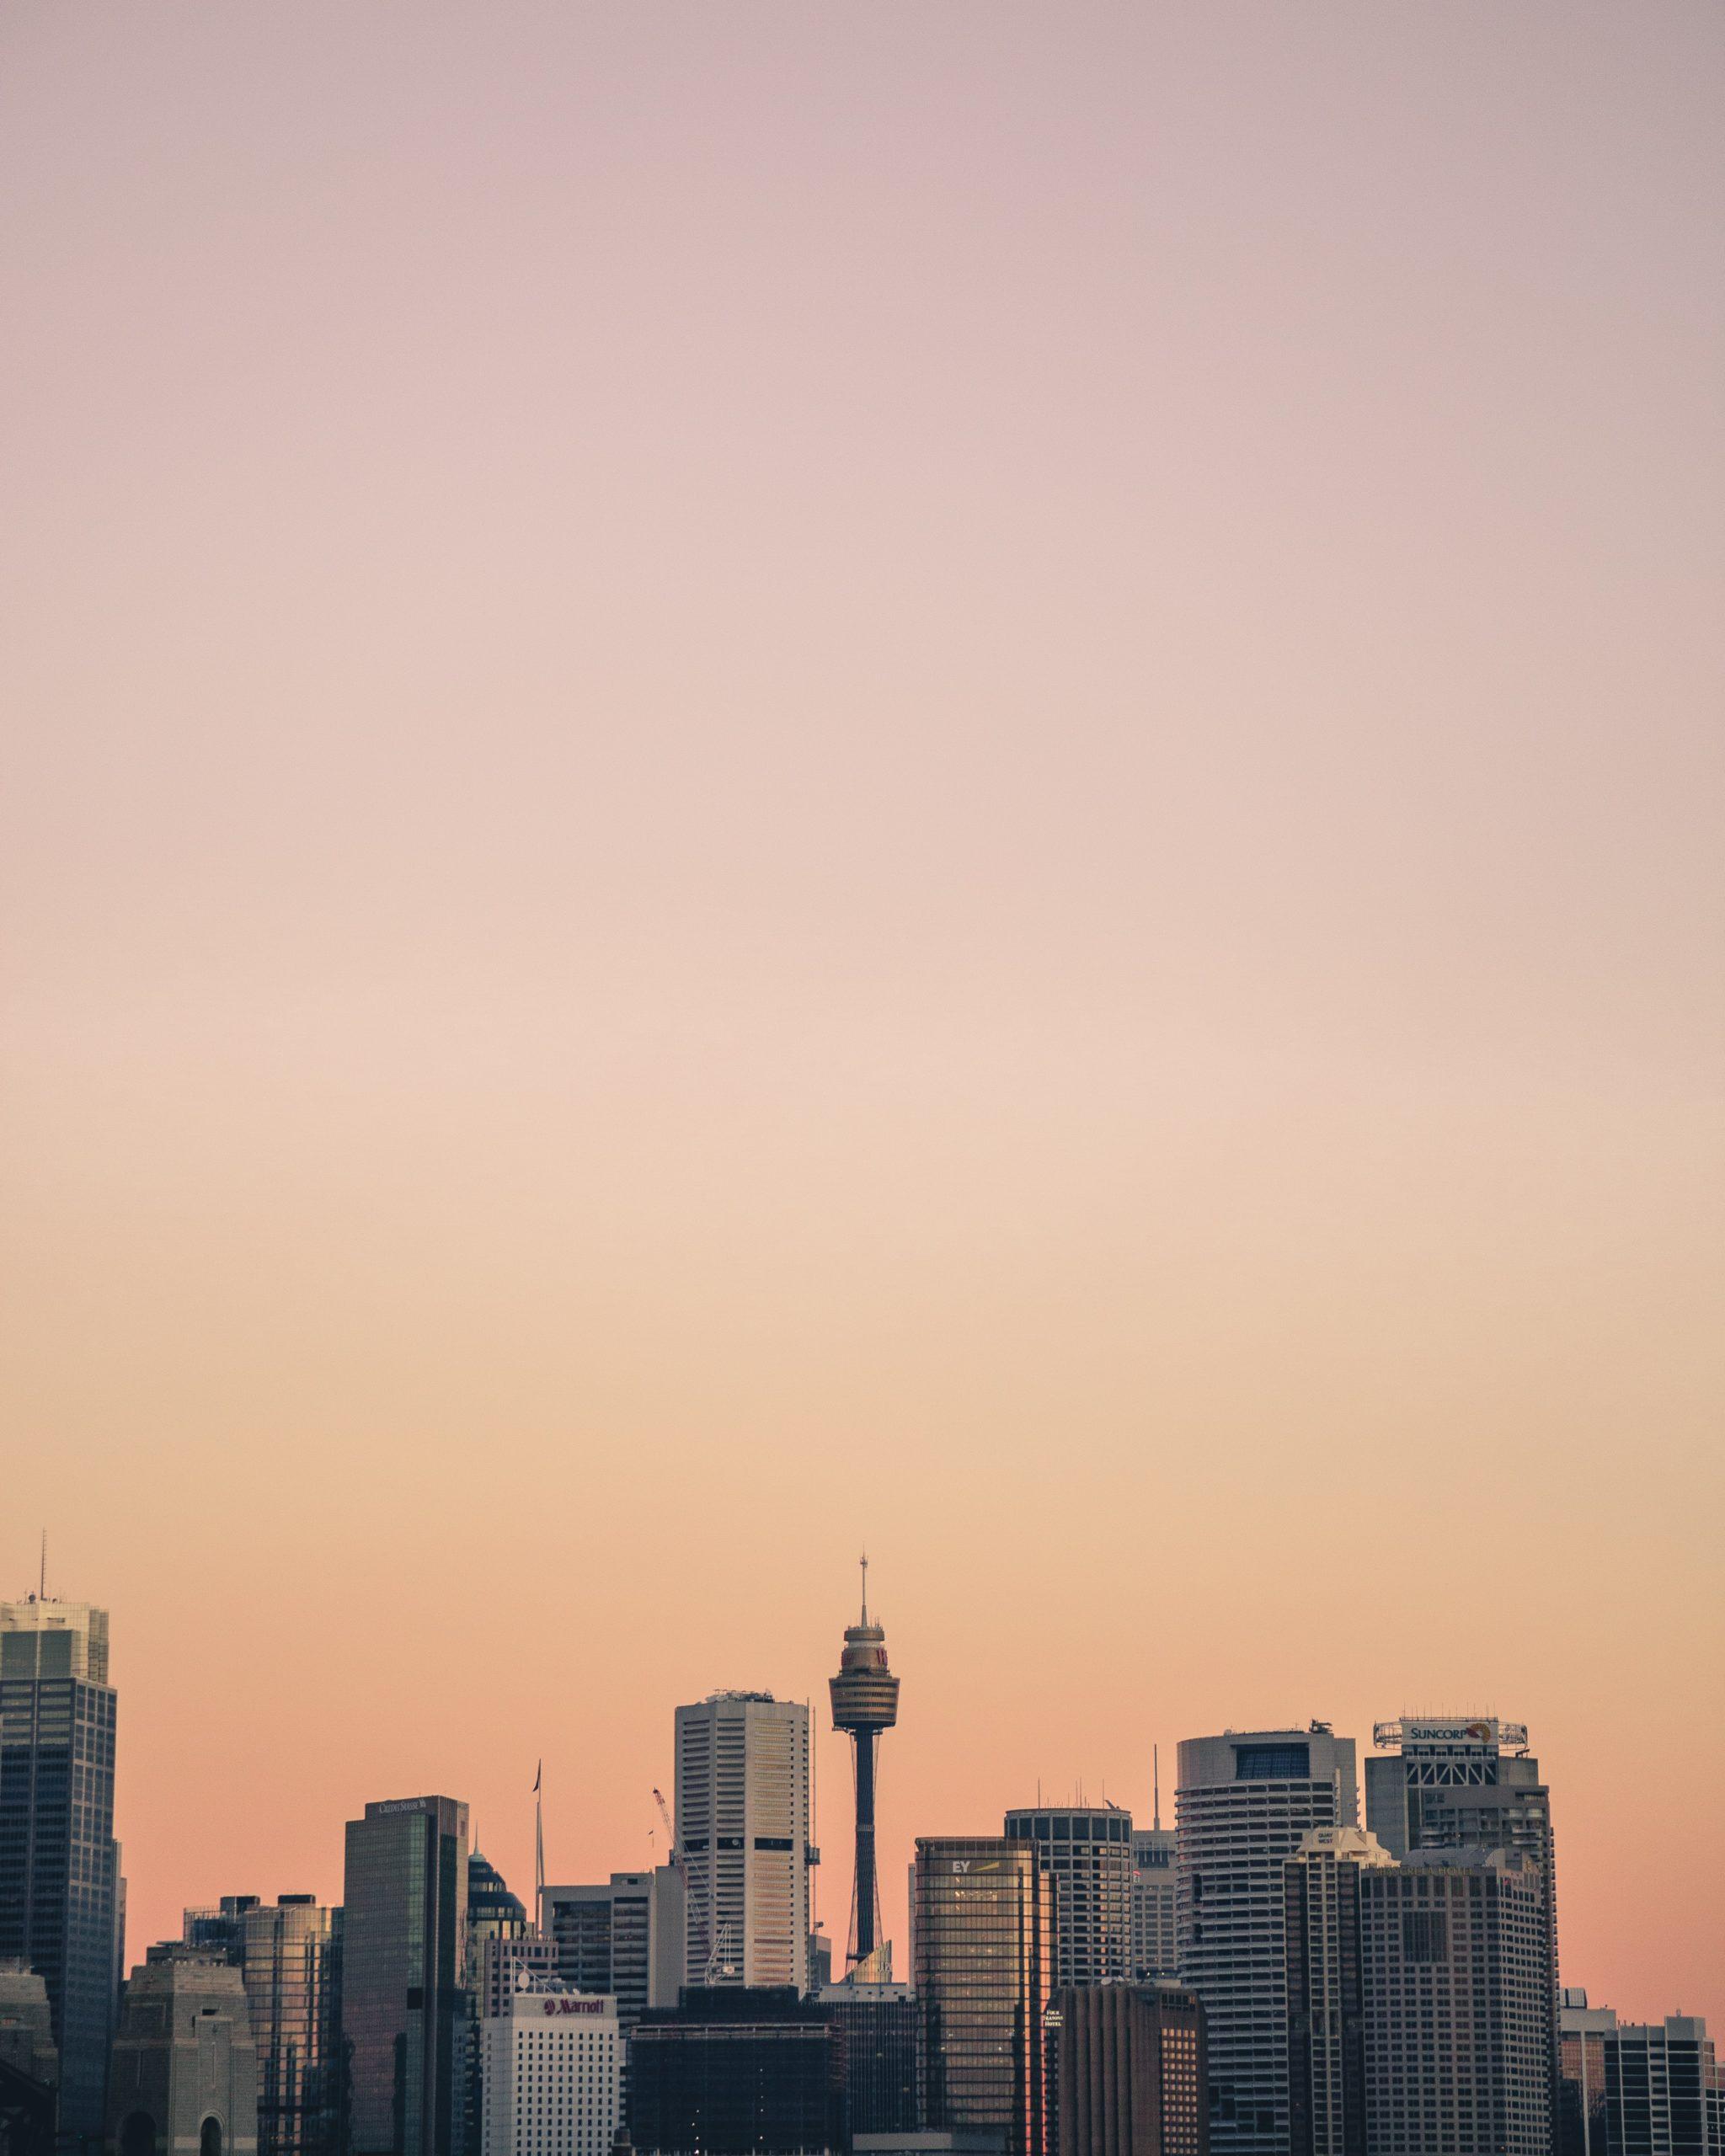 voyage sidney australie e visa 01